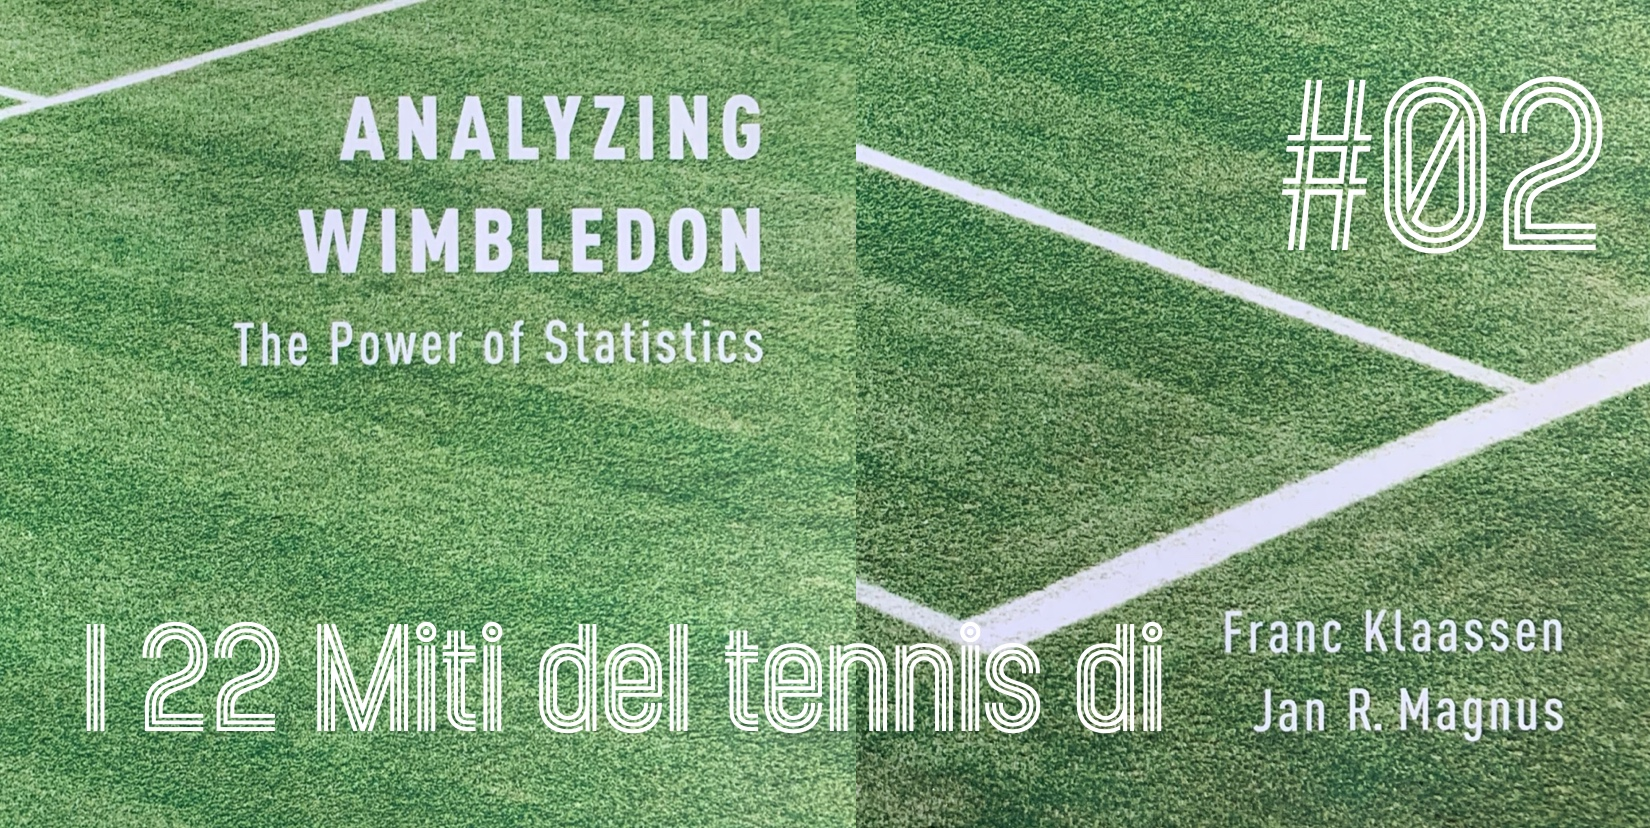 I 22 miti del tennis di Klaassen & Magnus – Mito 2 - settesei.it